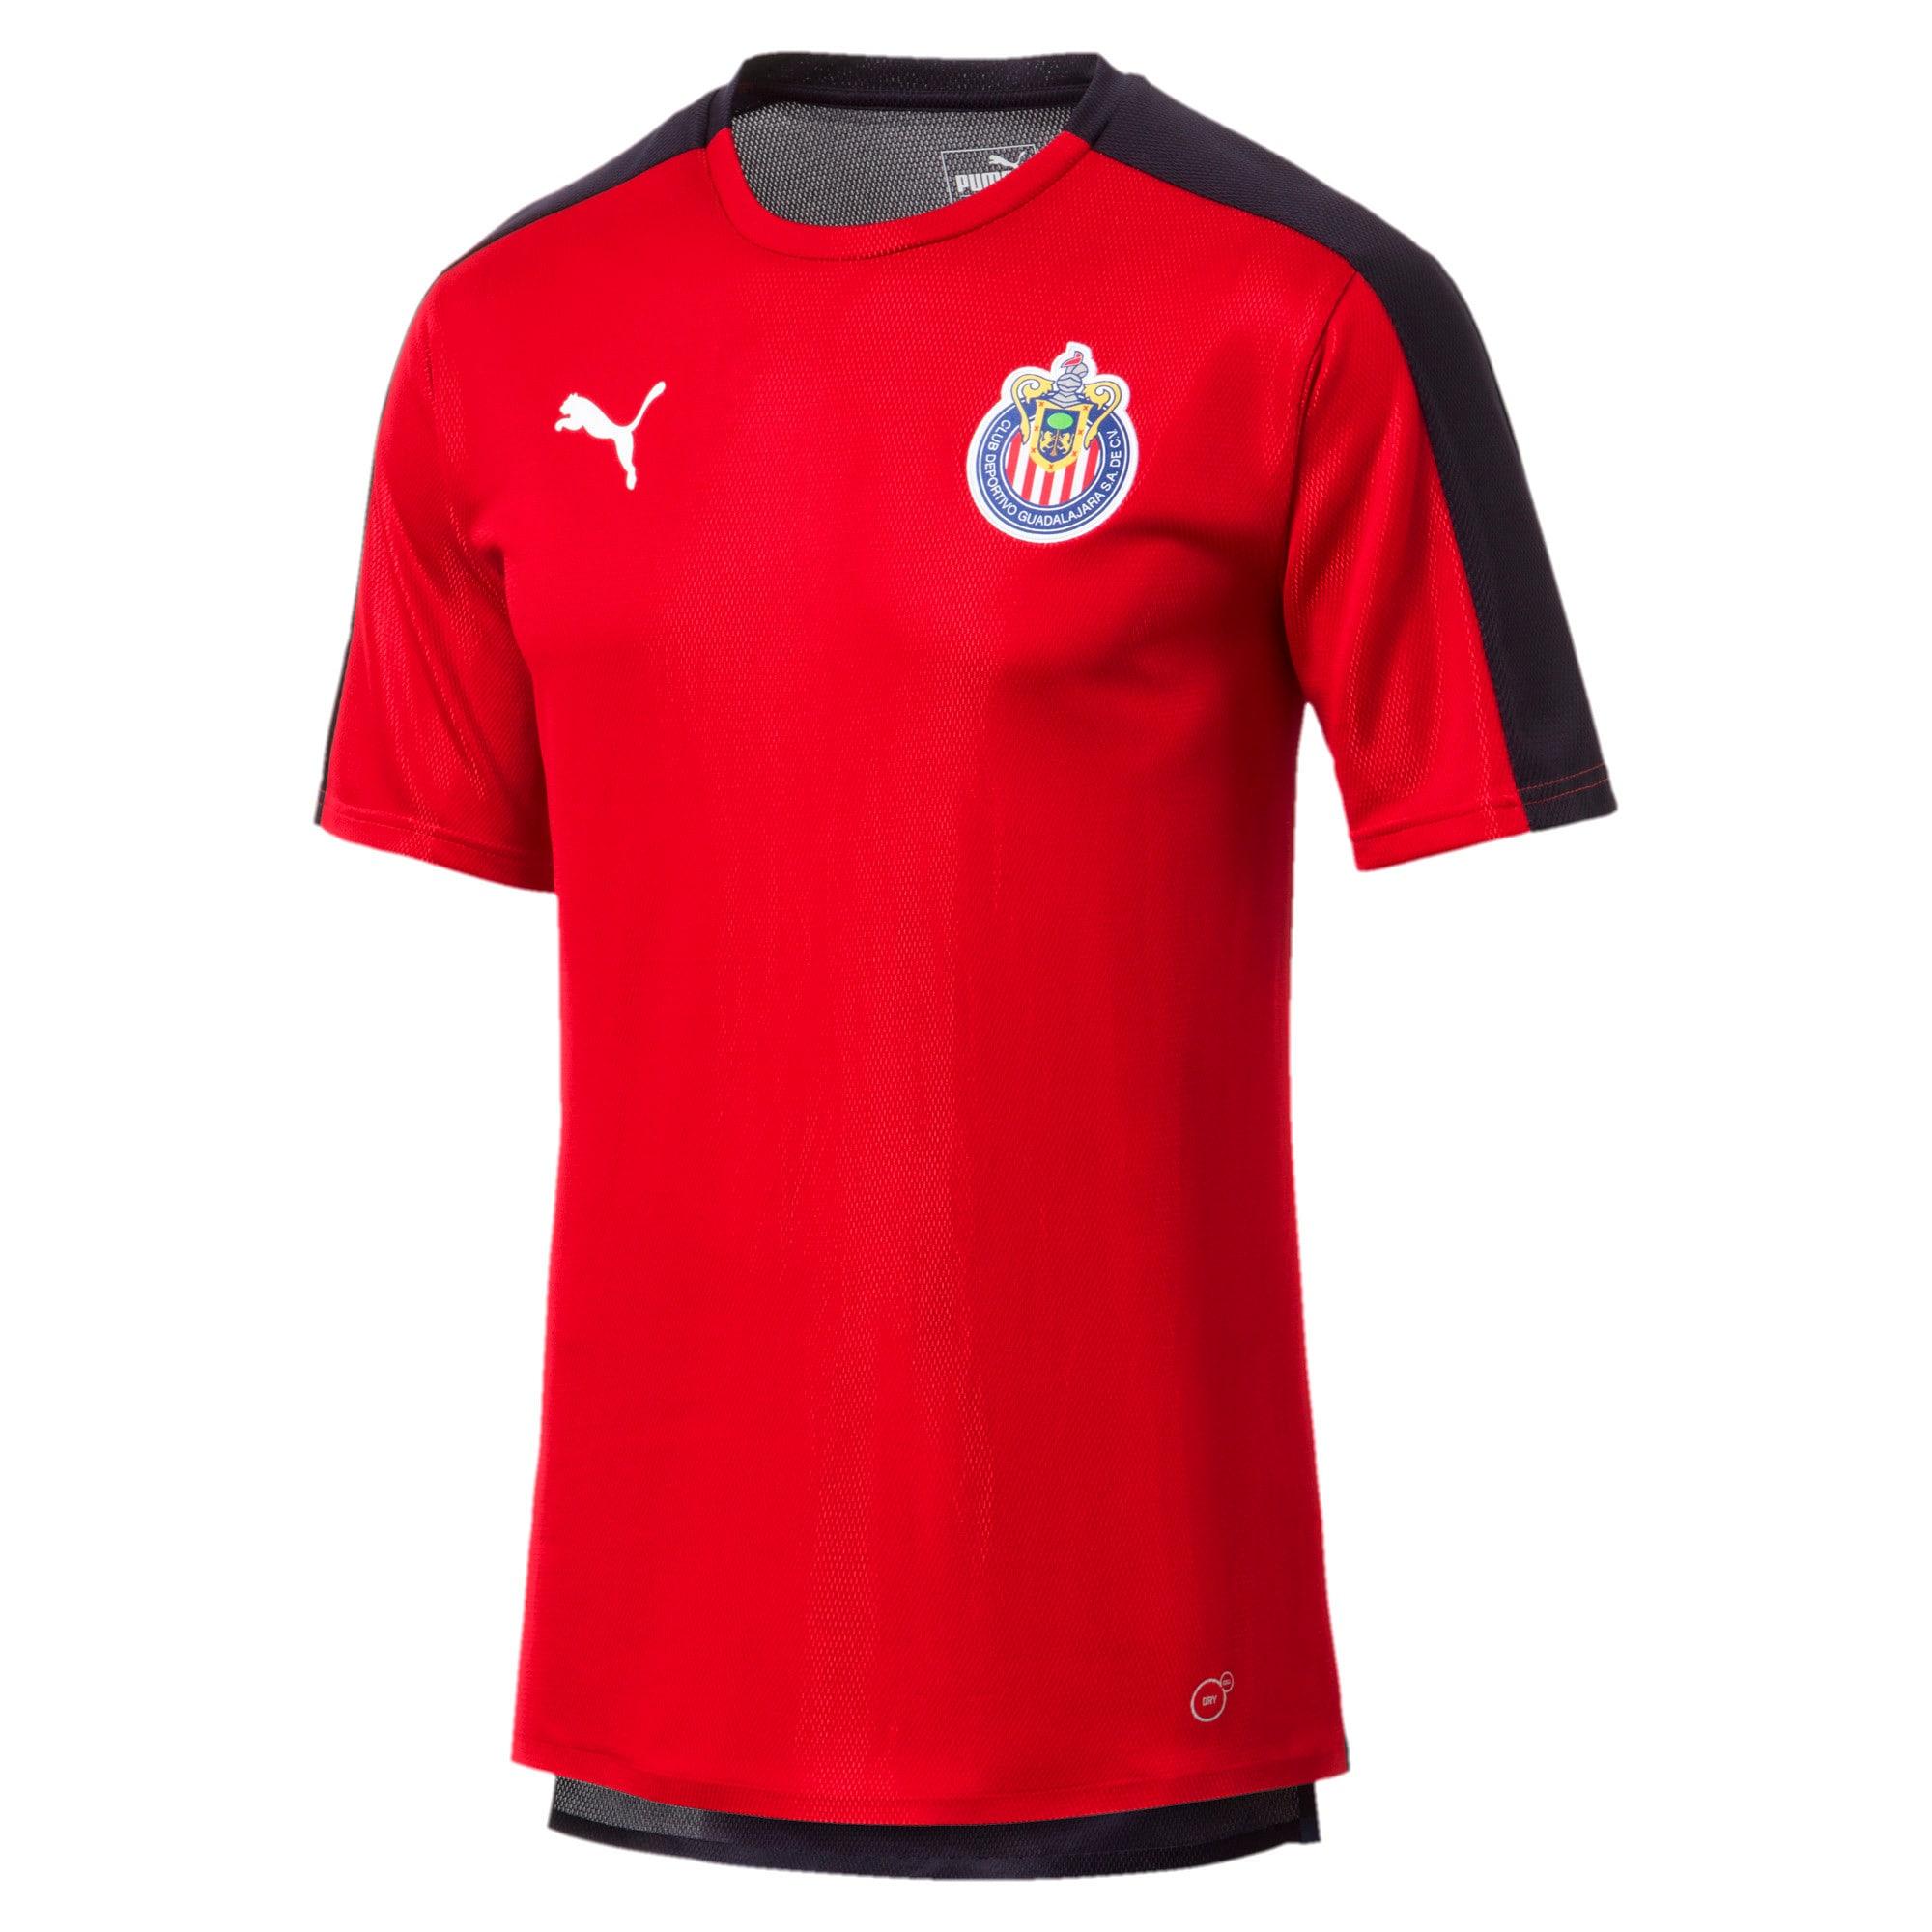 Thumbnail 1 of Chivas Stadium Jersey, Puma Red, medium